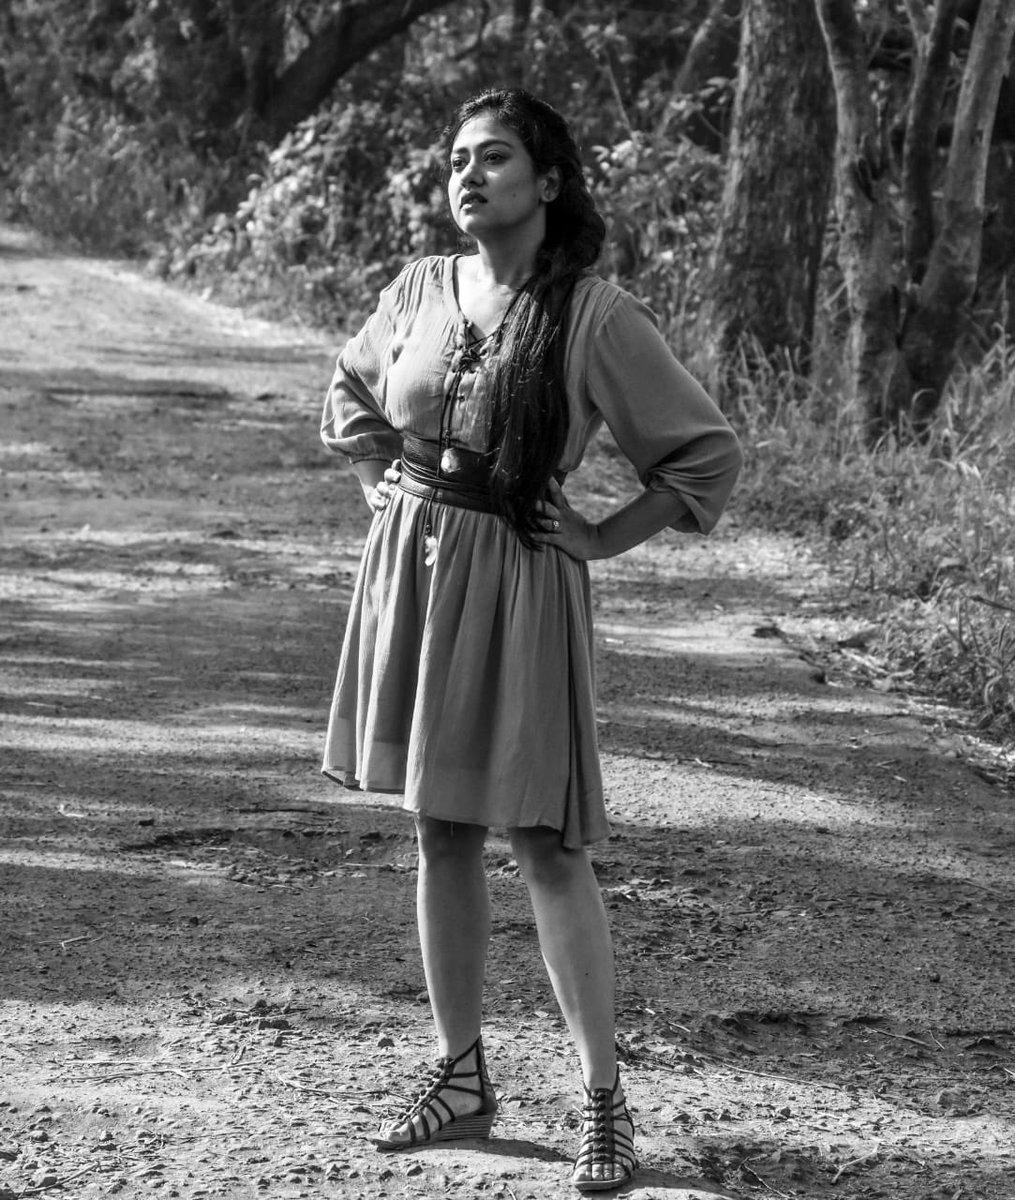 Be the warrior queen.....   #introspection #talestotell #indieauthor @Leadstart_P #fiction #novela #writersofinstagram #authorsofinstagram #writersociety #bookstagram #indieartist #instagood #blogger #mumbai #photography #photoshoot #photoshootideas #bnw #BookMarketingChat #chaospic.twitter.com/AAtFUTpubx